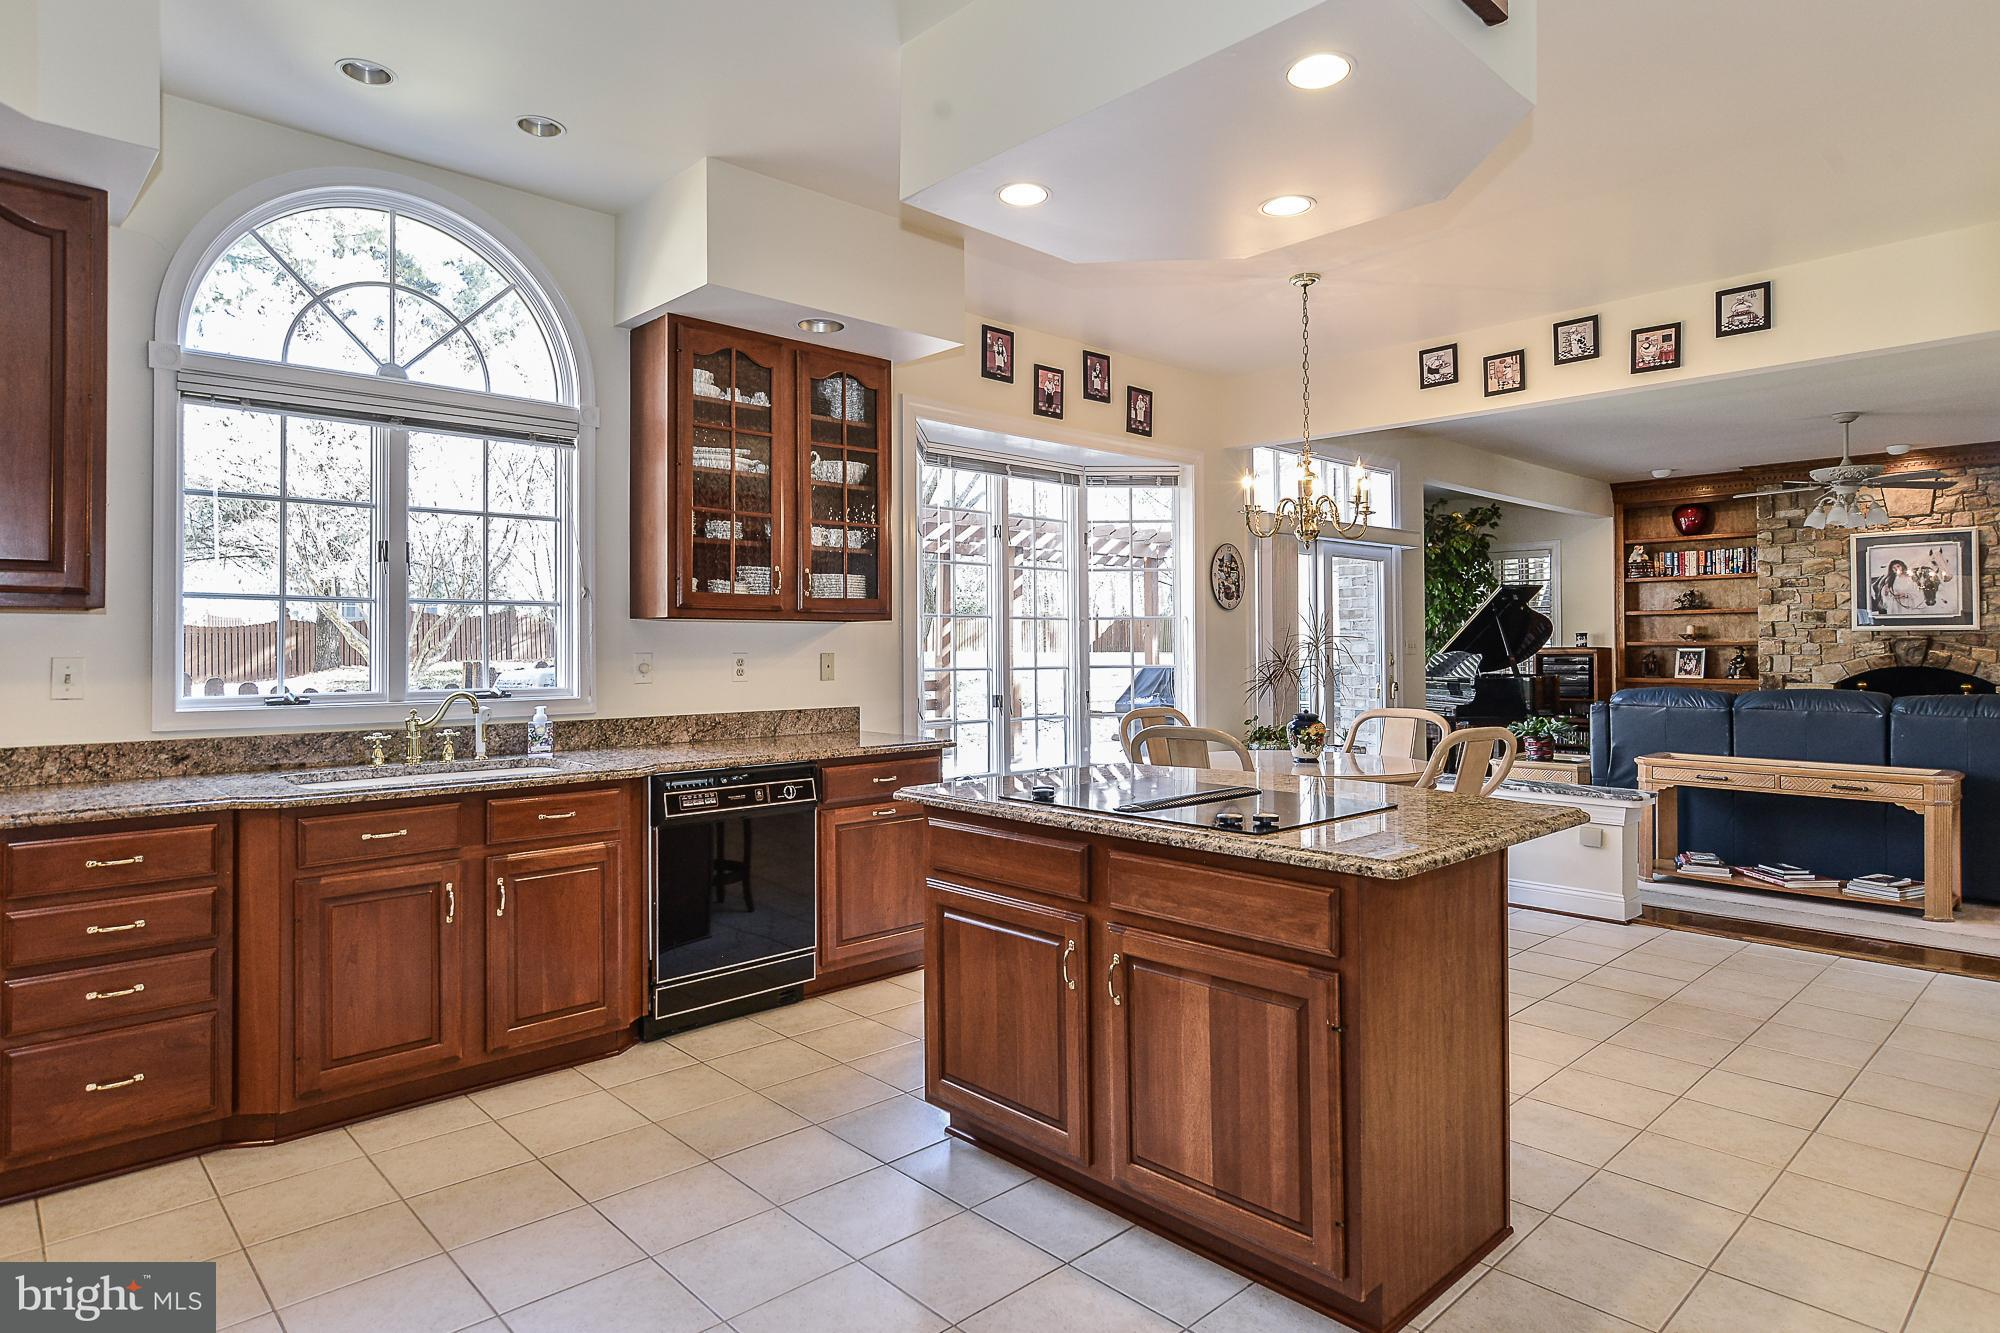 chesapeake kitchen design. 6595 CHESAPEAKE PLACE, Warrenton, VA 20187 Chesapeake Kitchen Design